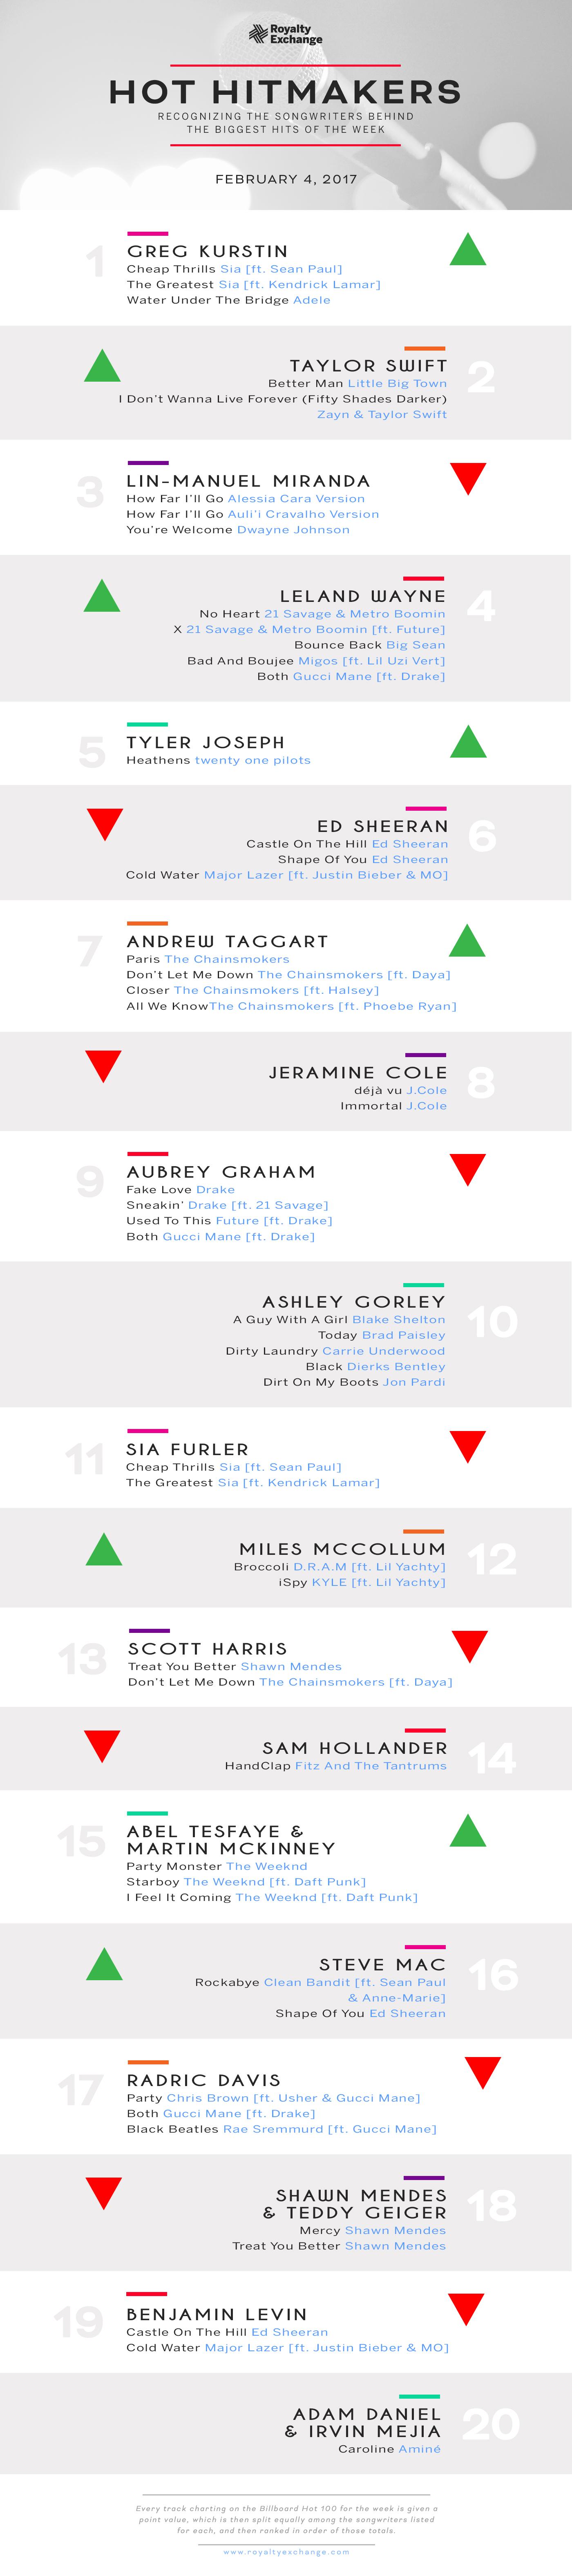 Hot Hitmakers Feb. 4